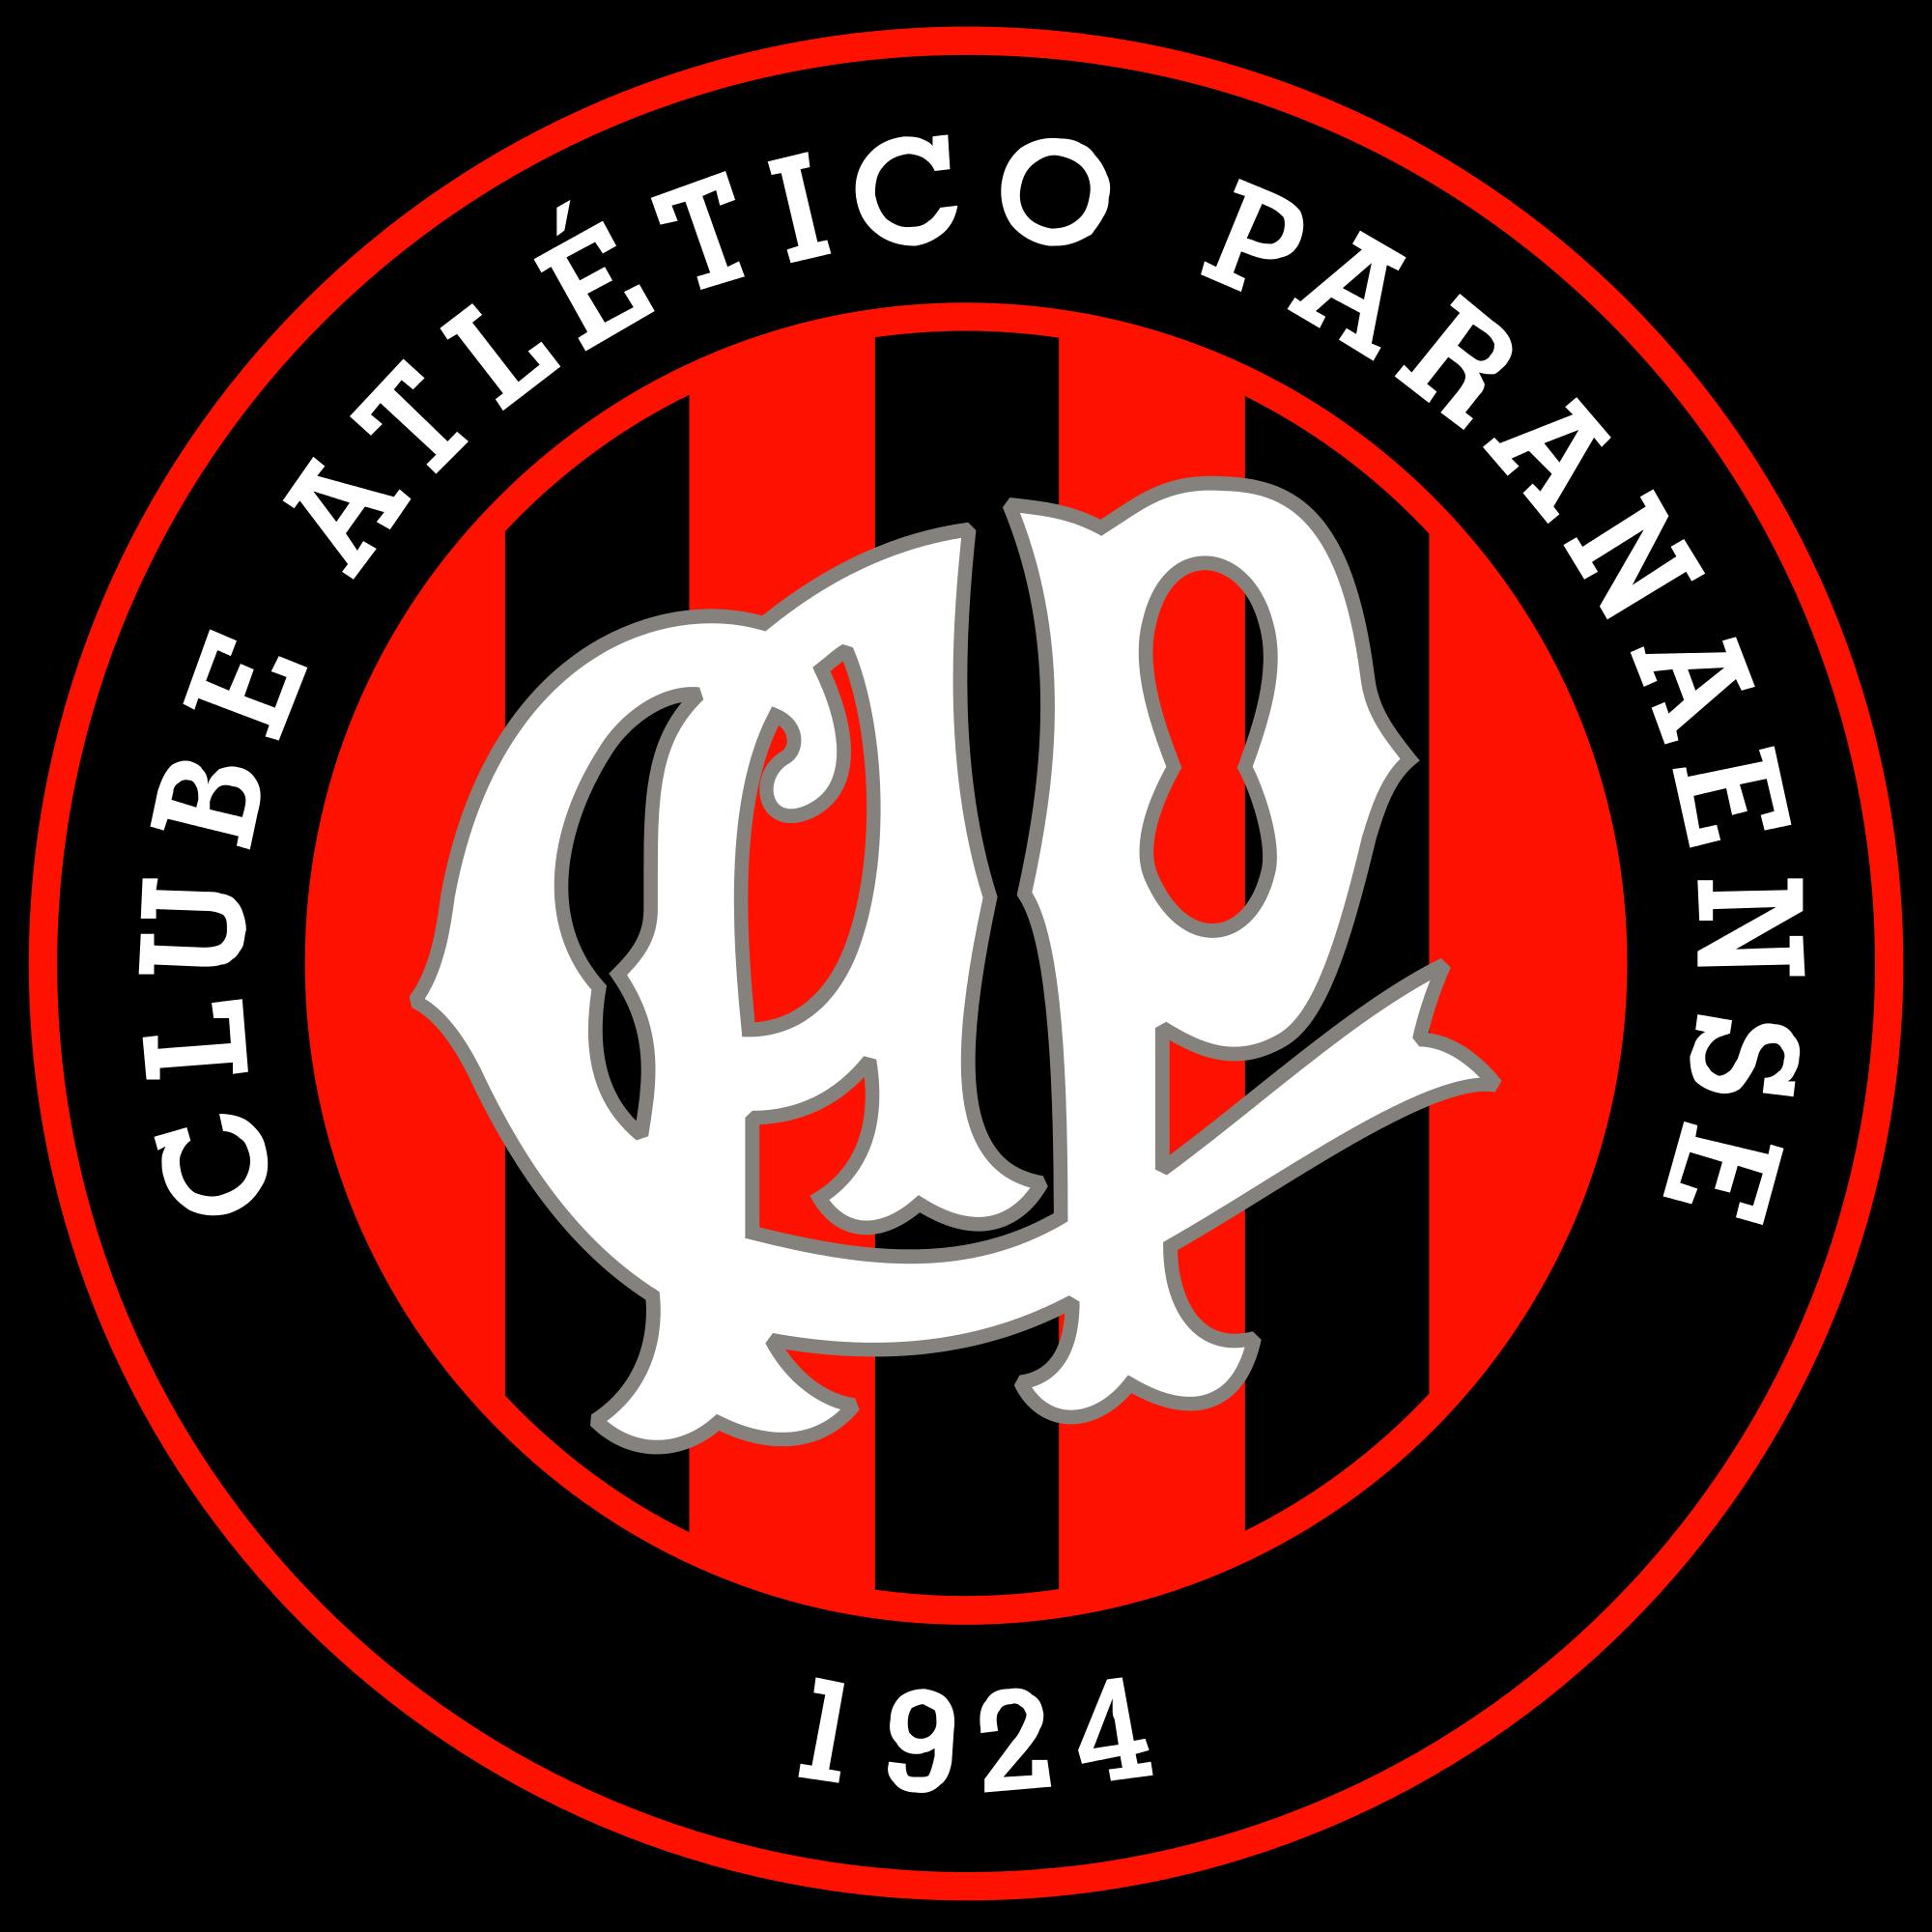 Atletico Paranaense 1924